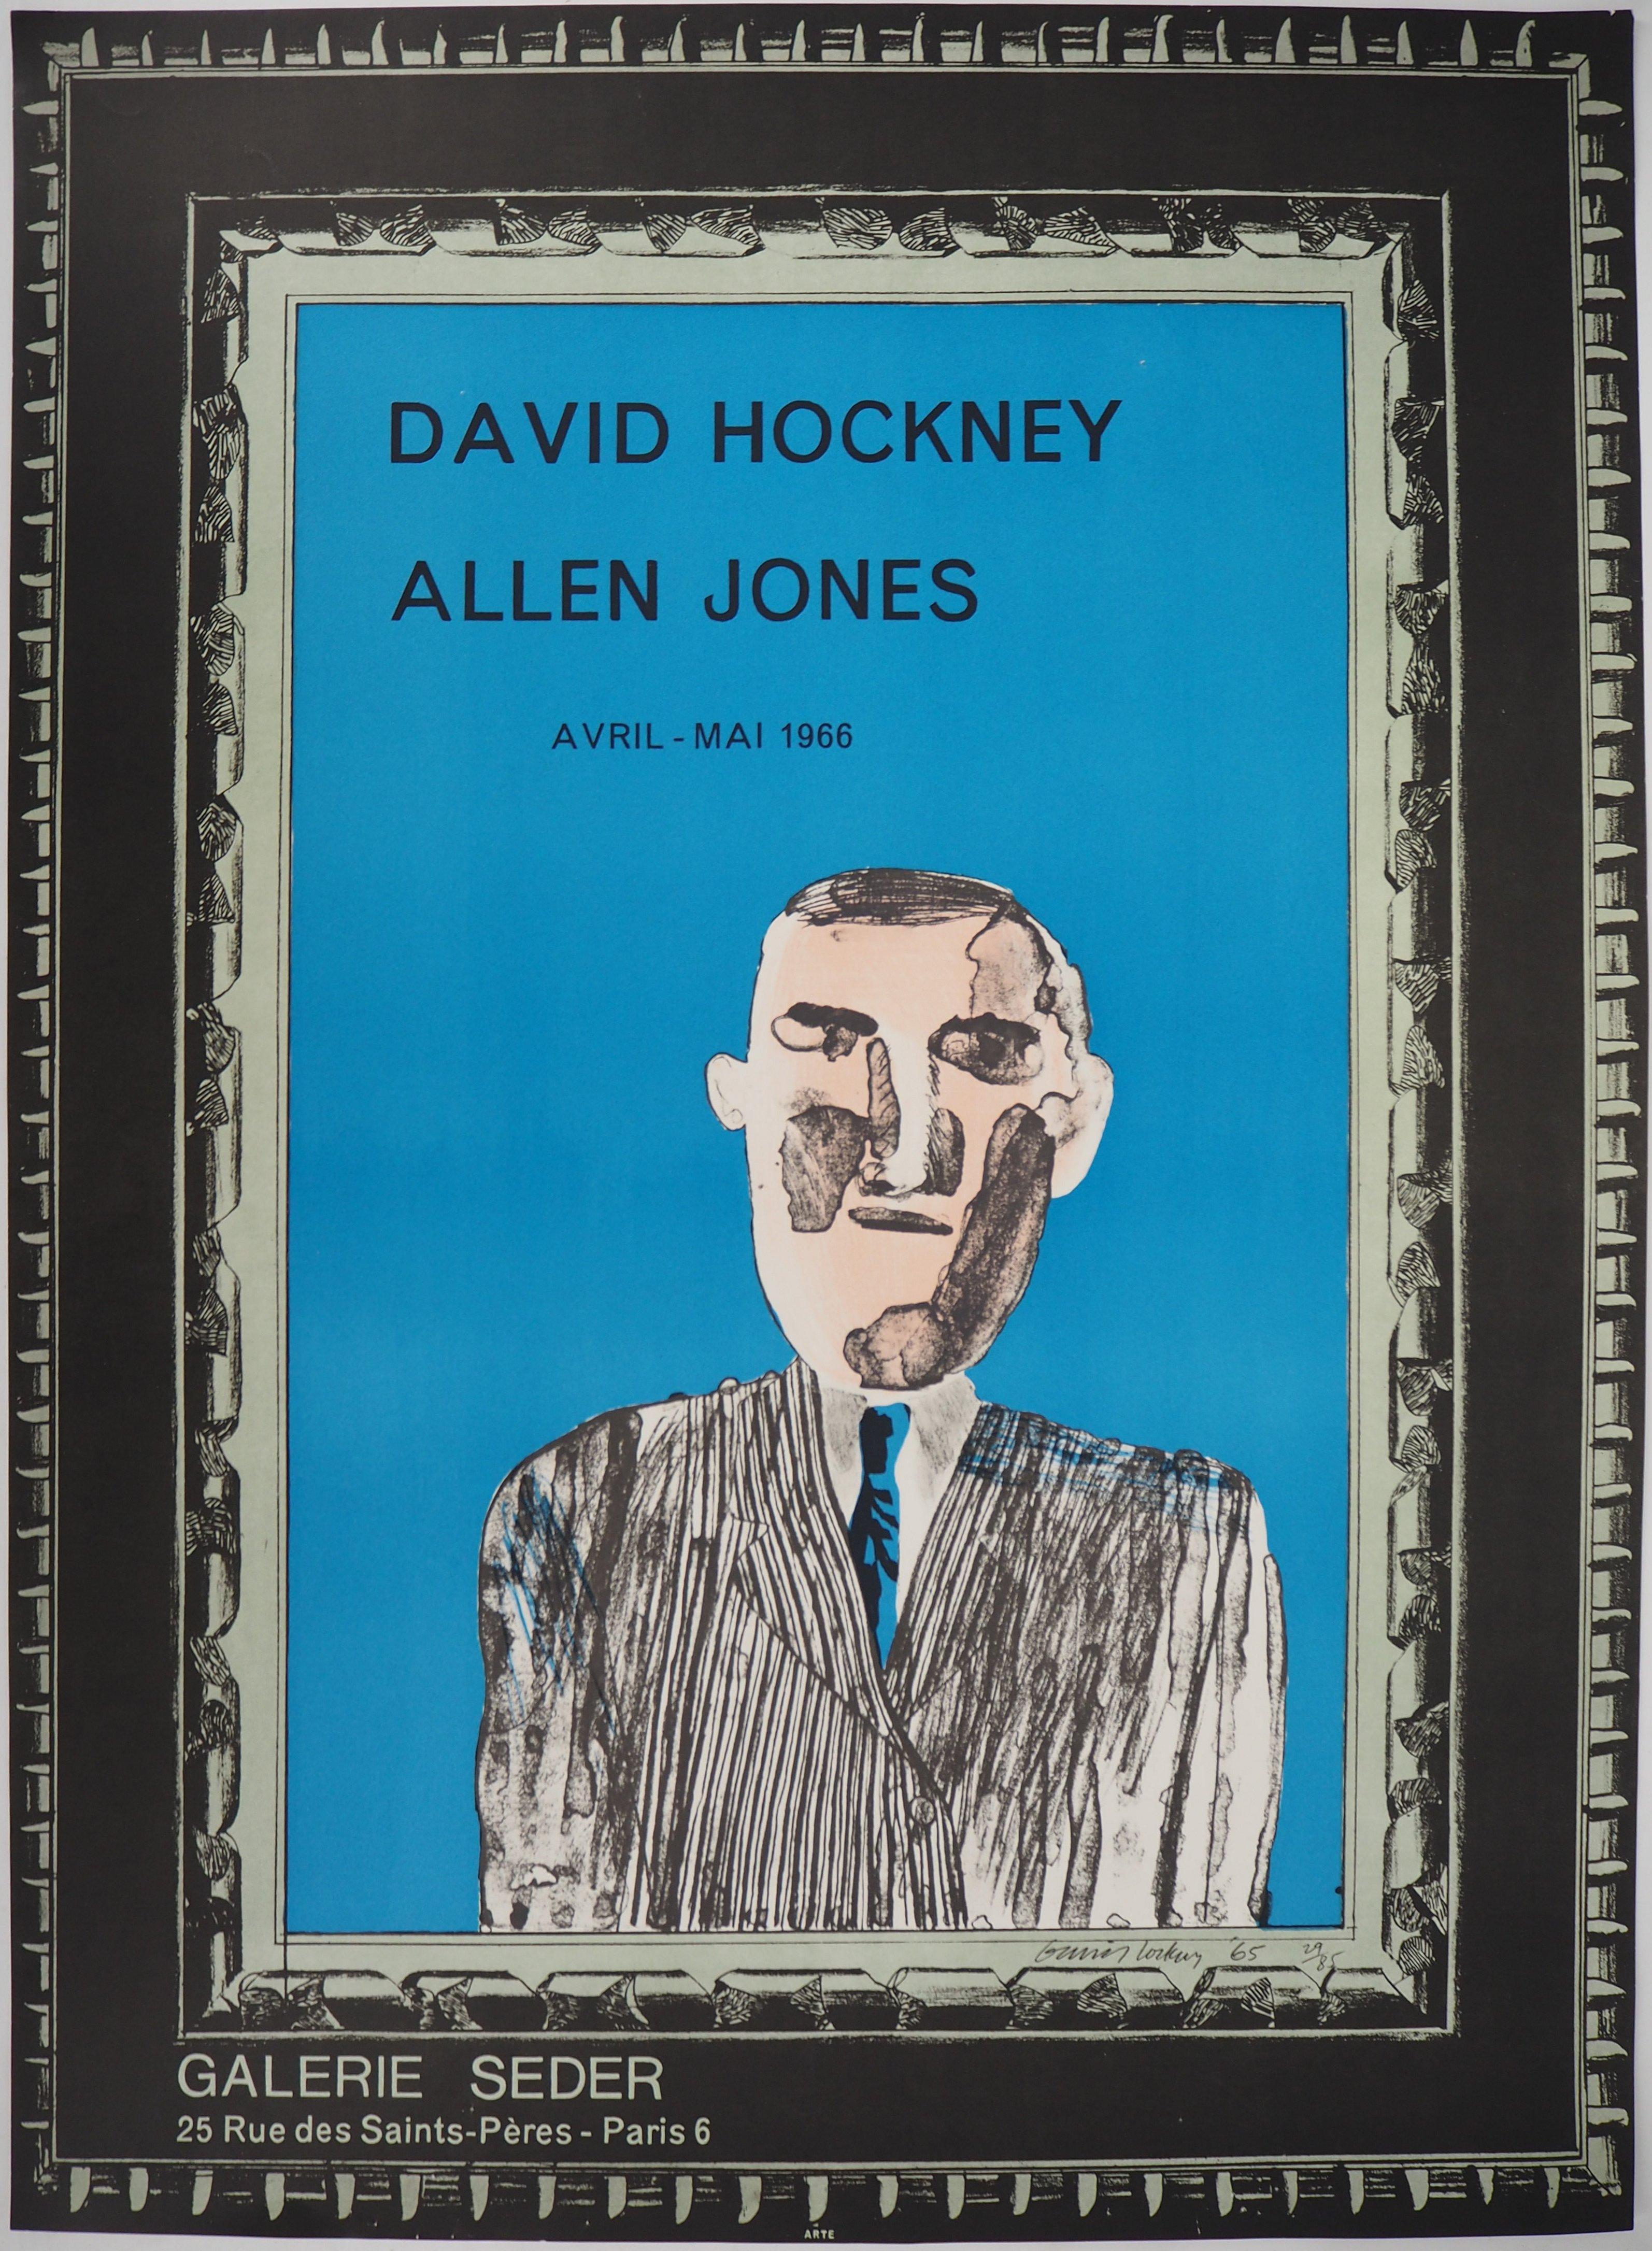 David Hockney and Allen Jones at Gallery Seder - Lithograph